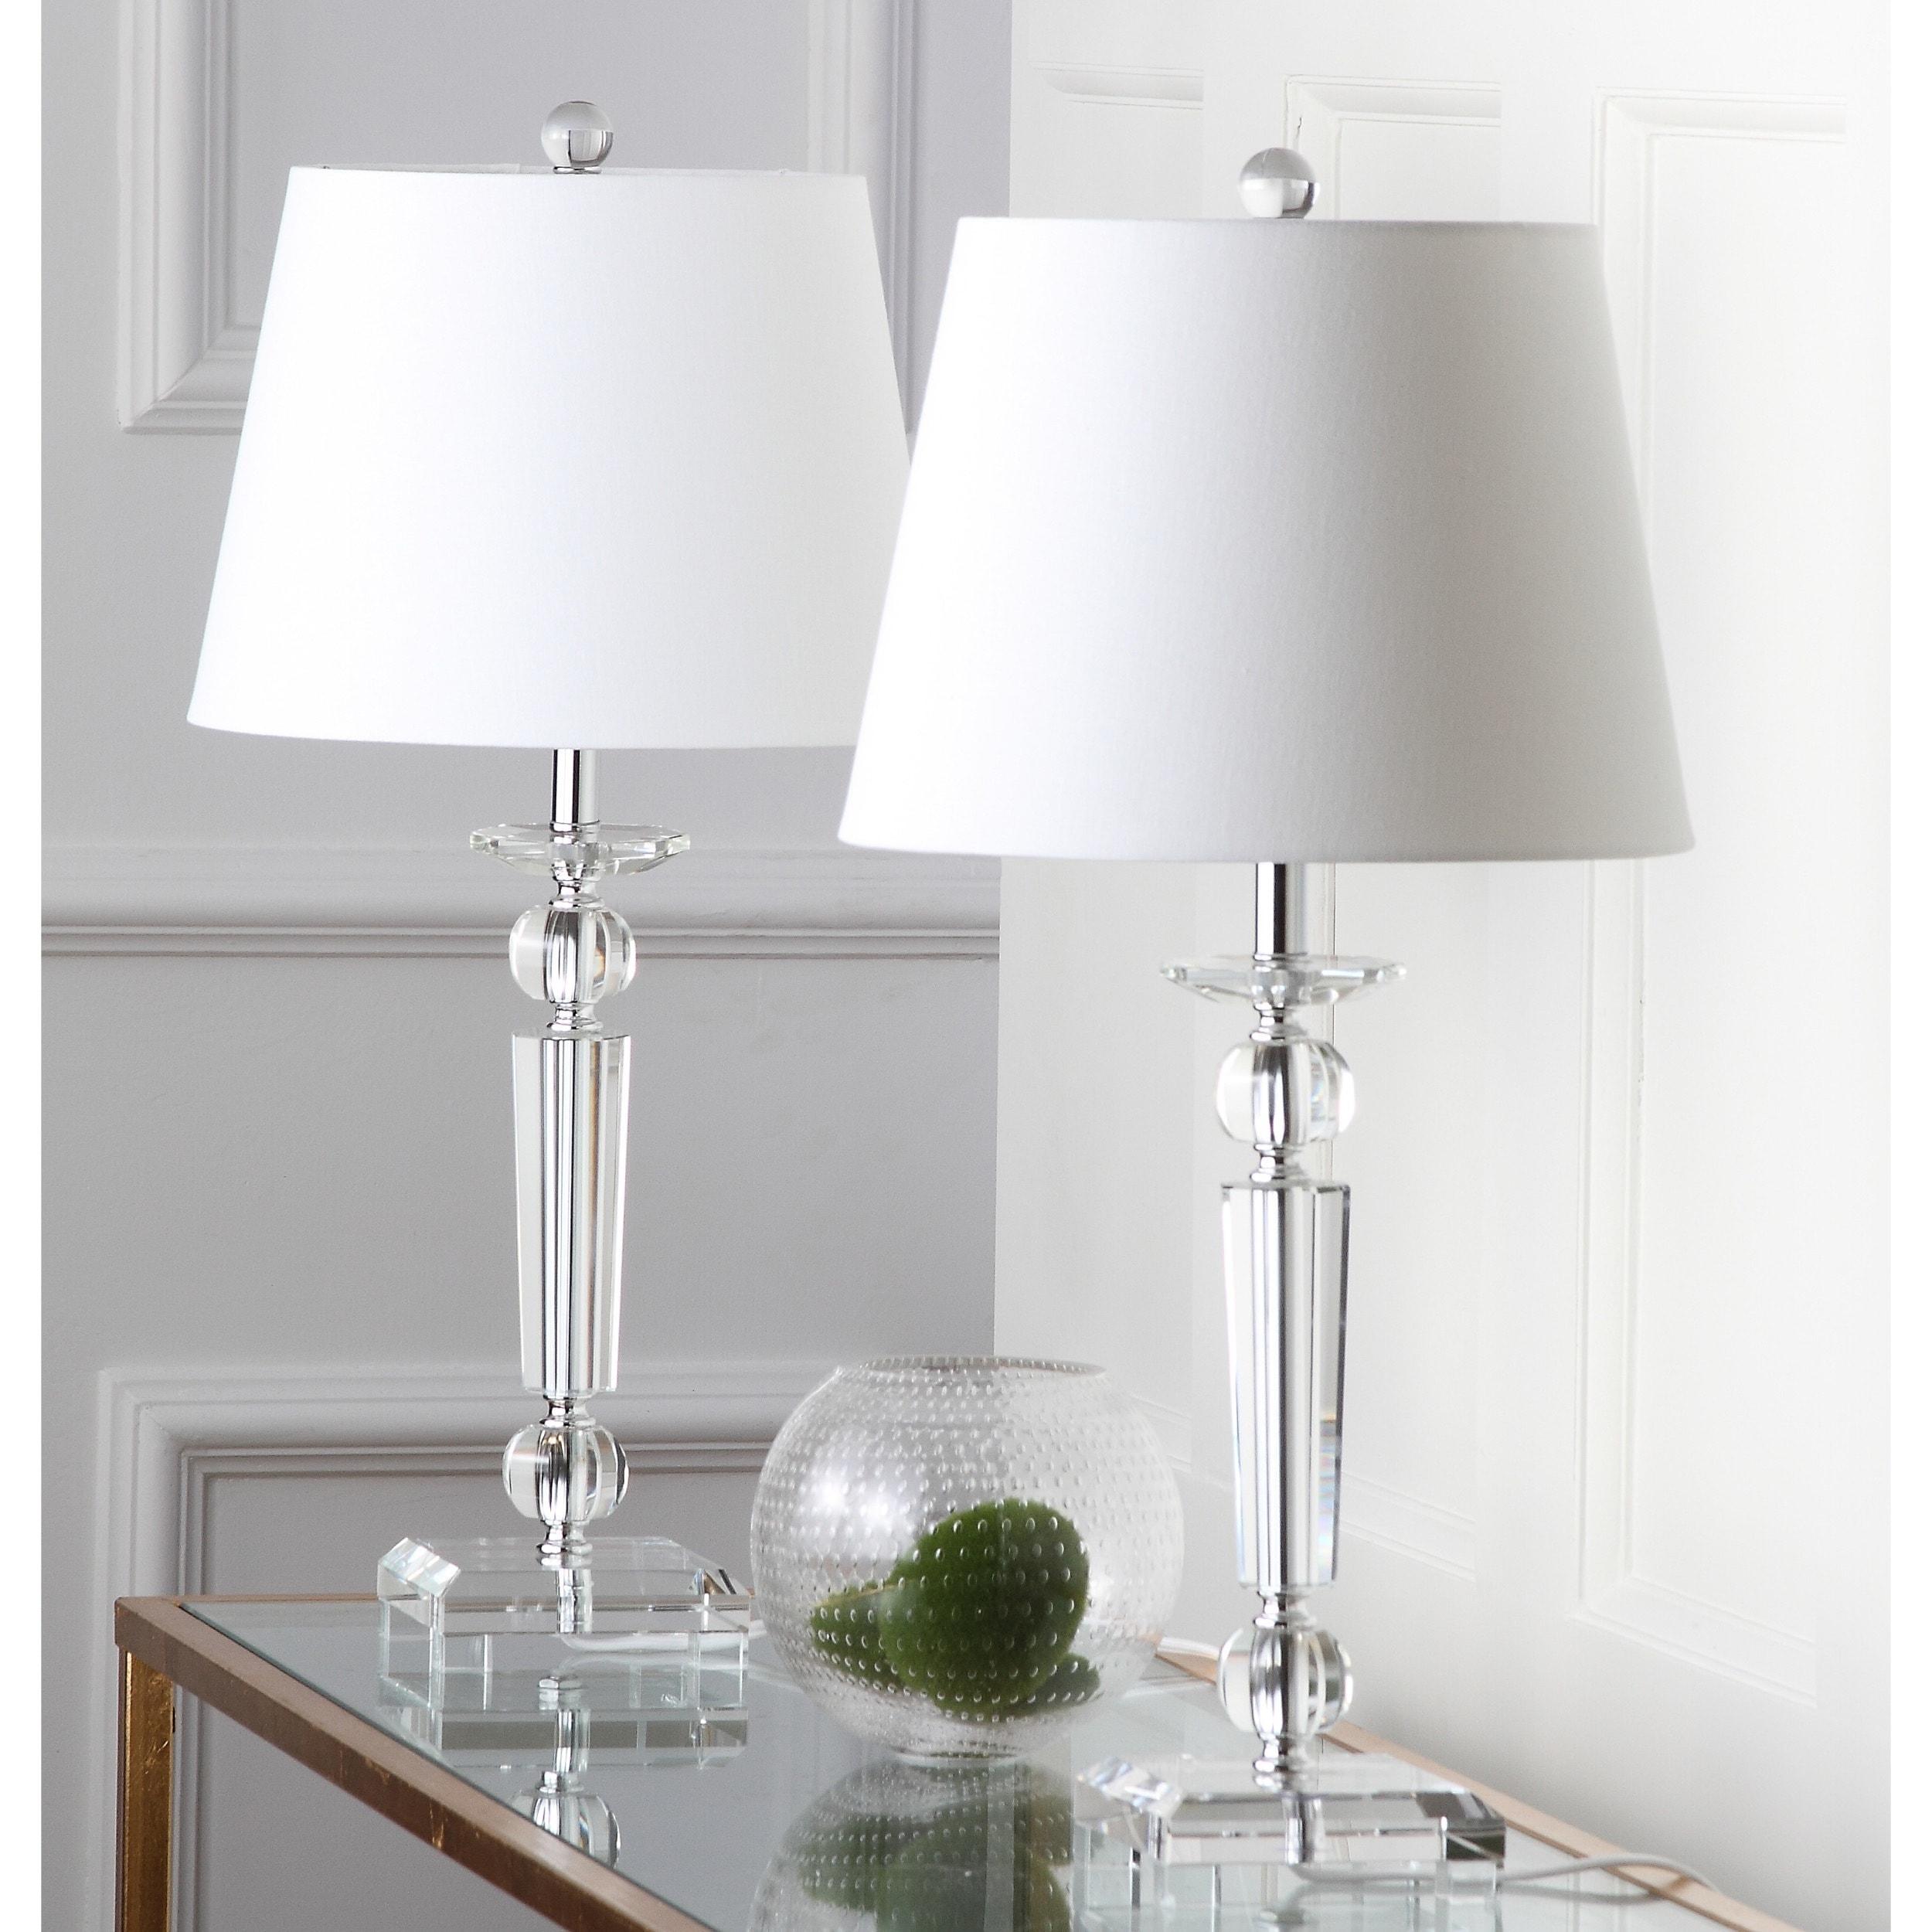 Safavieh Lighting 23-inch Imogene Crystal Table L& (Set of 2)  sc 1 st  Overstock & Safavieh Lighting 23-inch Imogene Crystal Table Lamp (Set of 2 ...